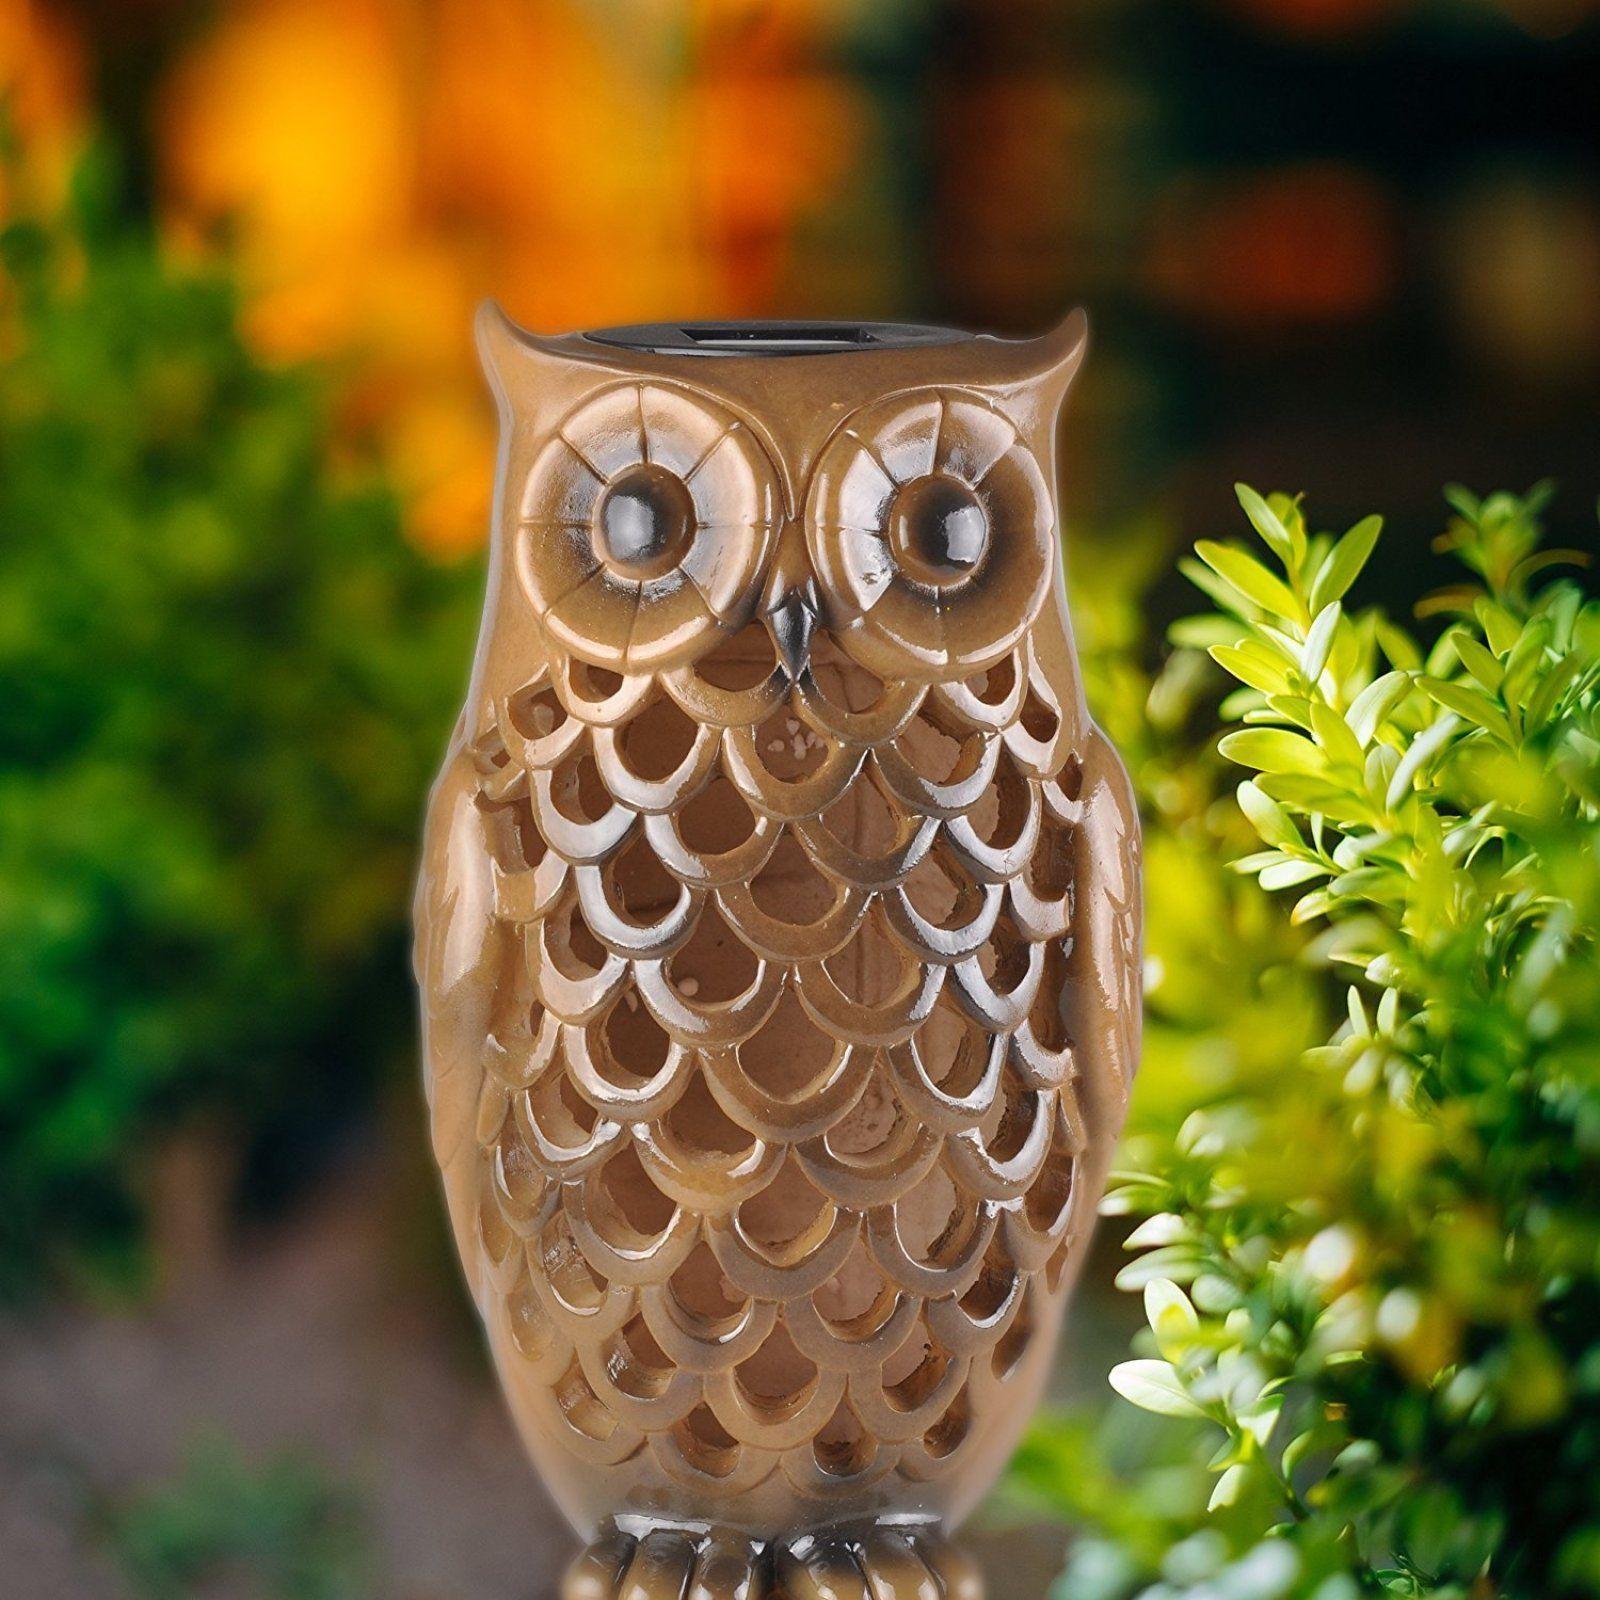 Solar Power Garden Decor Art Yard Owl Statue Outdoor Patio Lawn LED ...